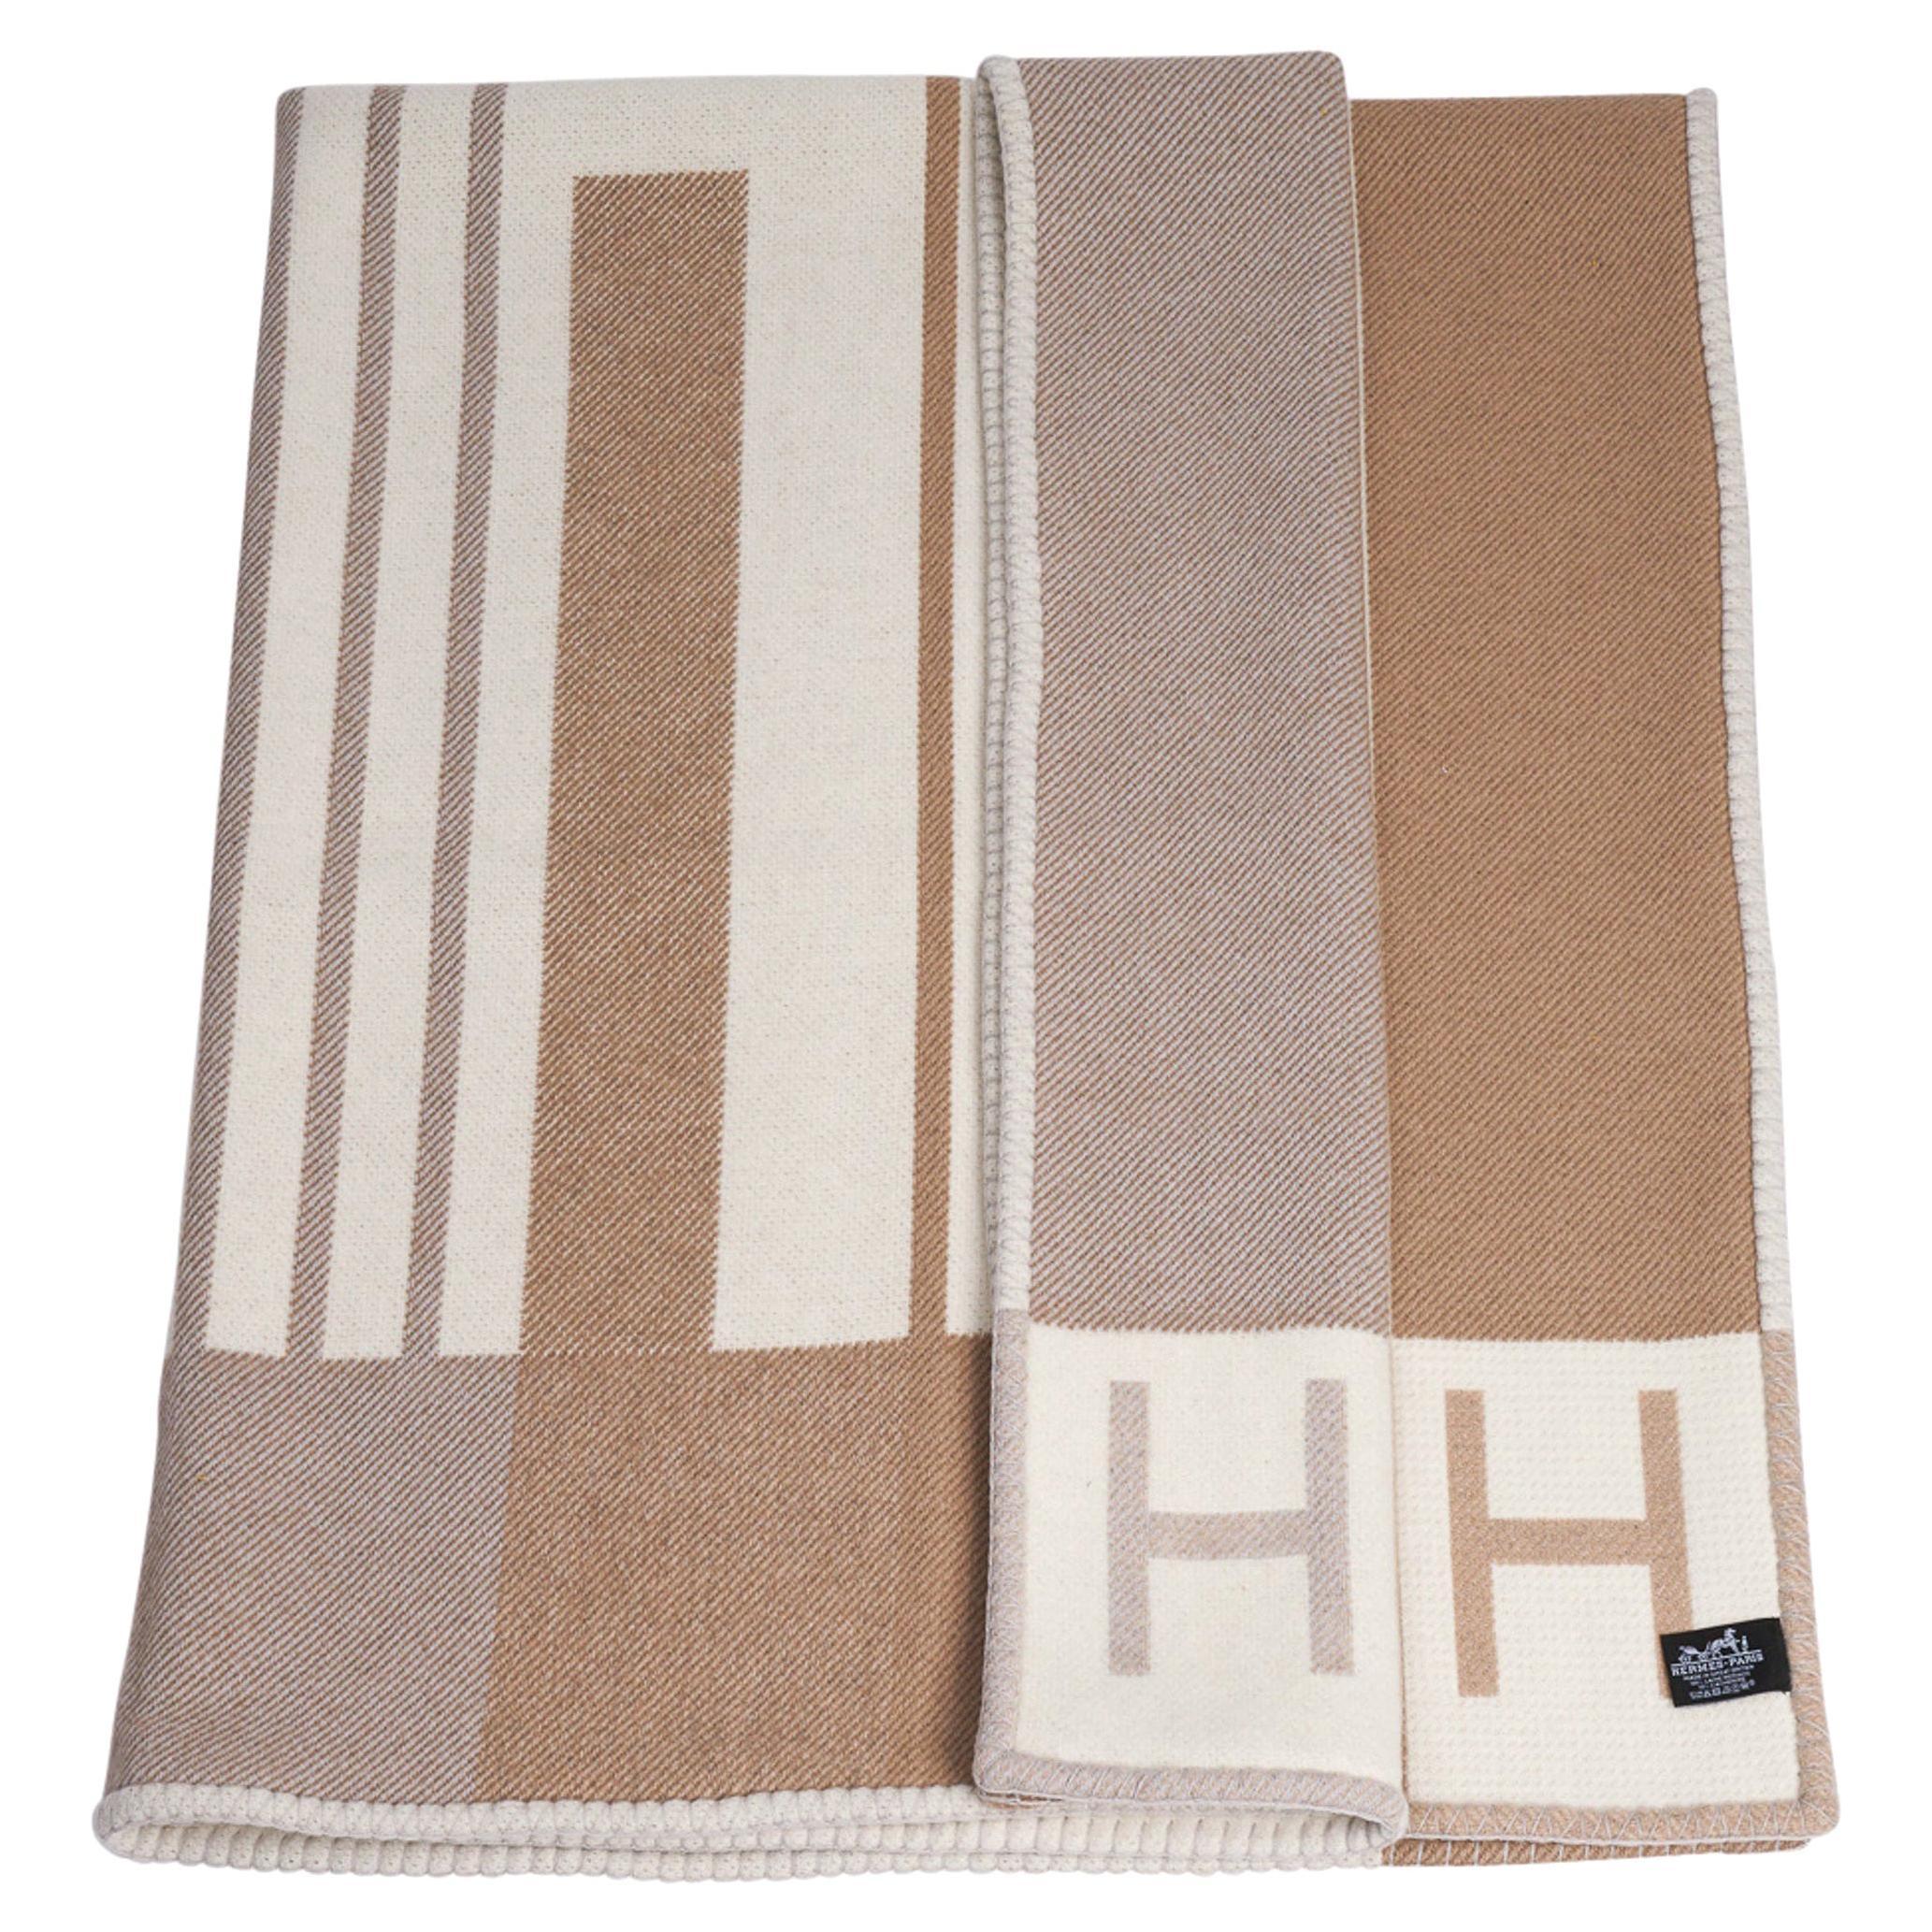 Hermes Avalon Vibration Throw Blanket Ecru Naturel Wool / Cashmere New